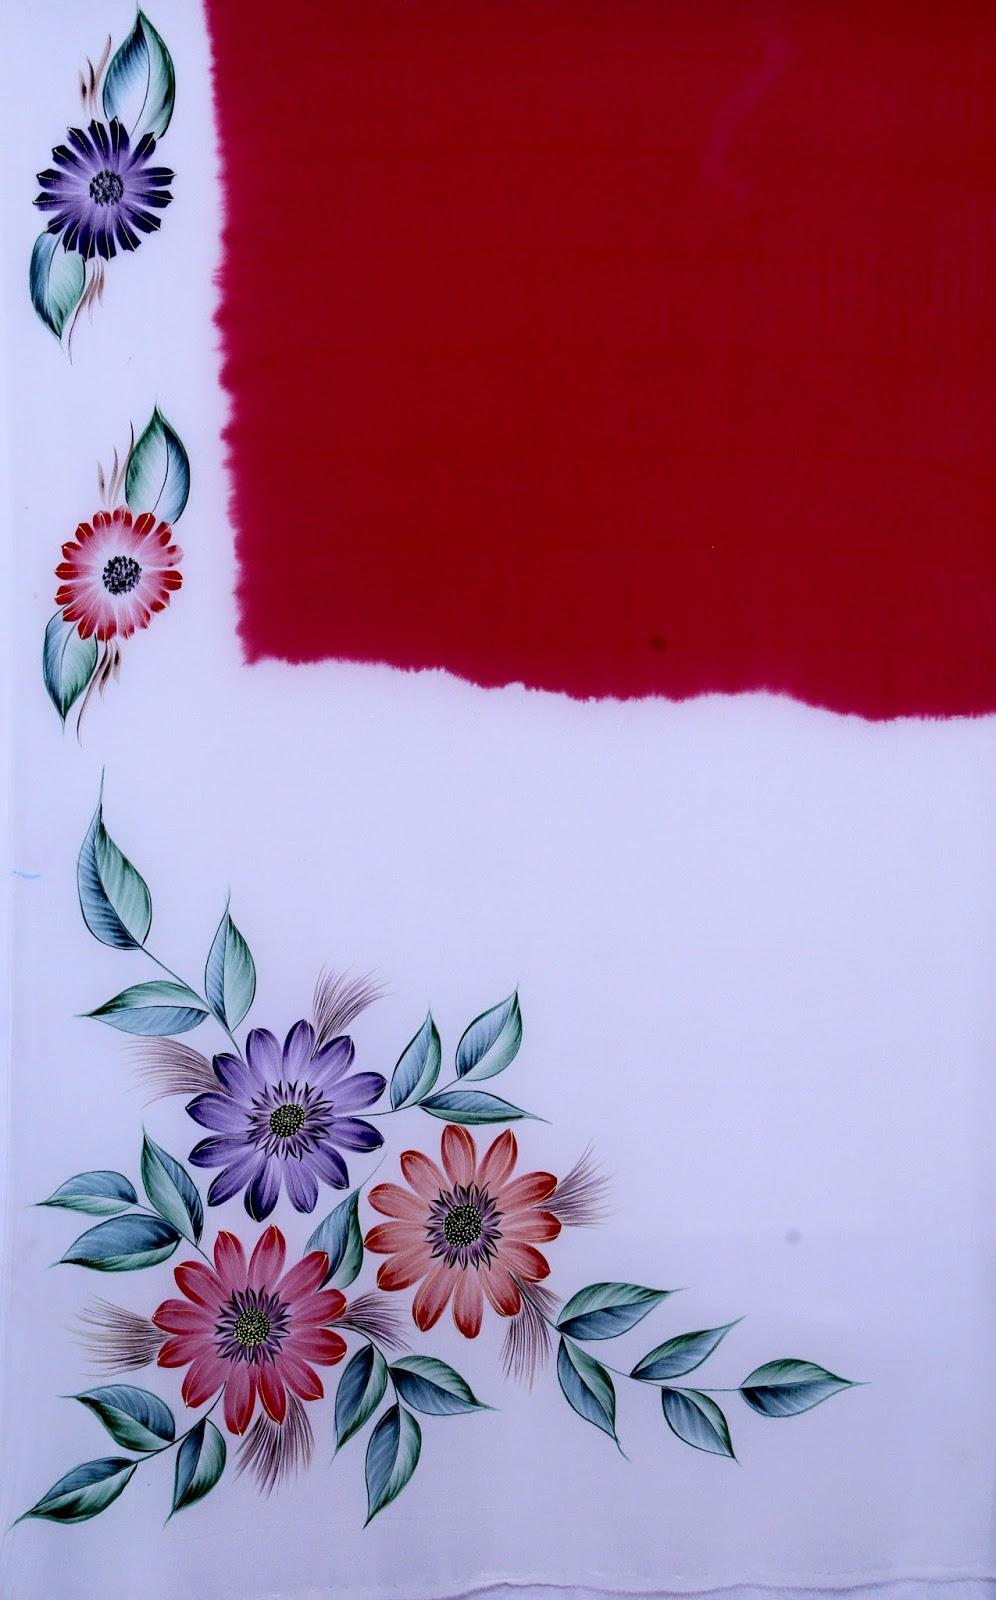 fabric painting, freehand painting, fabric painting pictures, free hand fabric painting, easy fabric painting ideas, free hand painting photos, free hand painting Images, free hand painting designs,